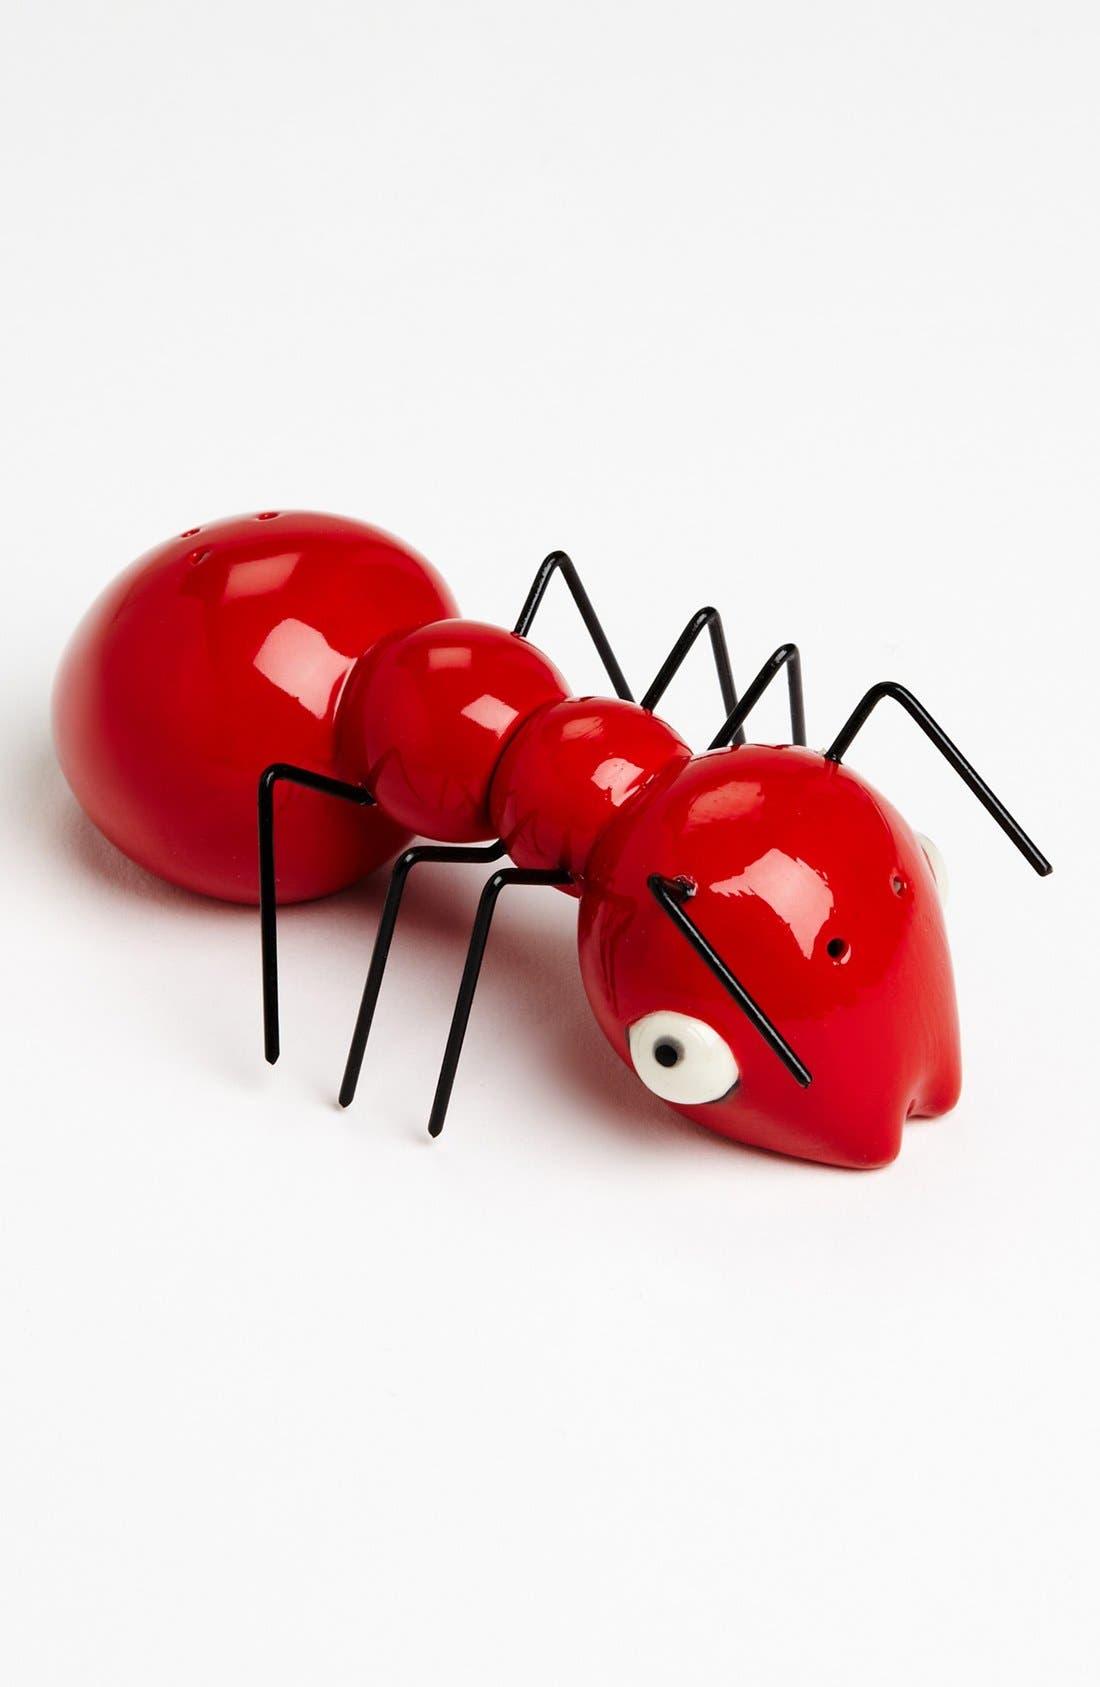 Alternate Image 1 Selected - Ant Salt & Pepper Shakers